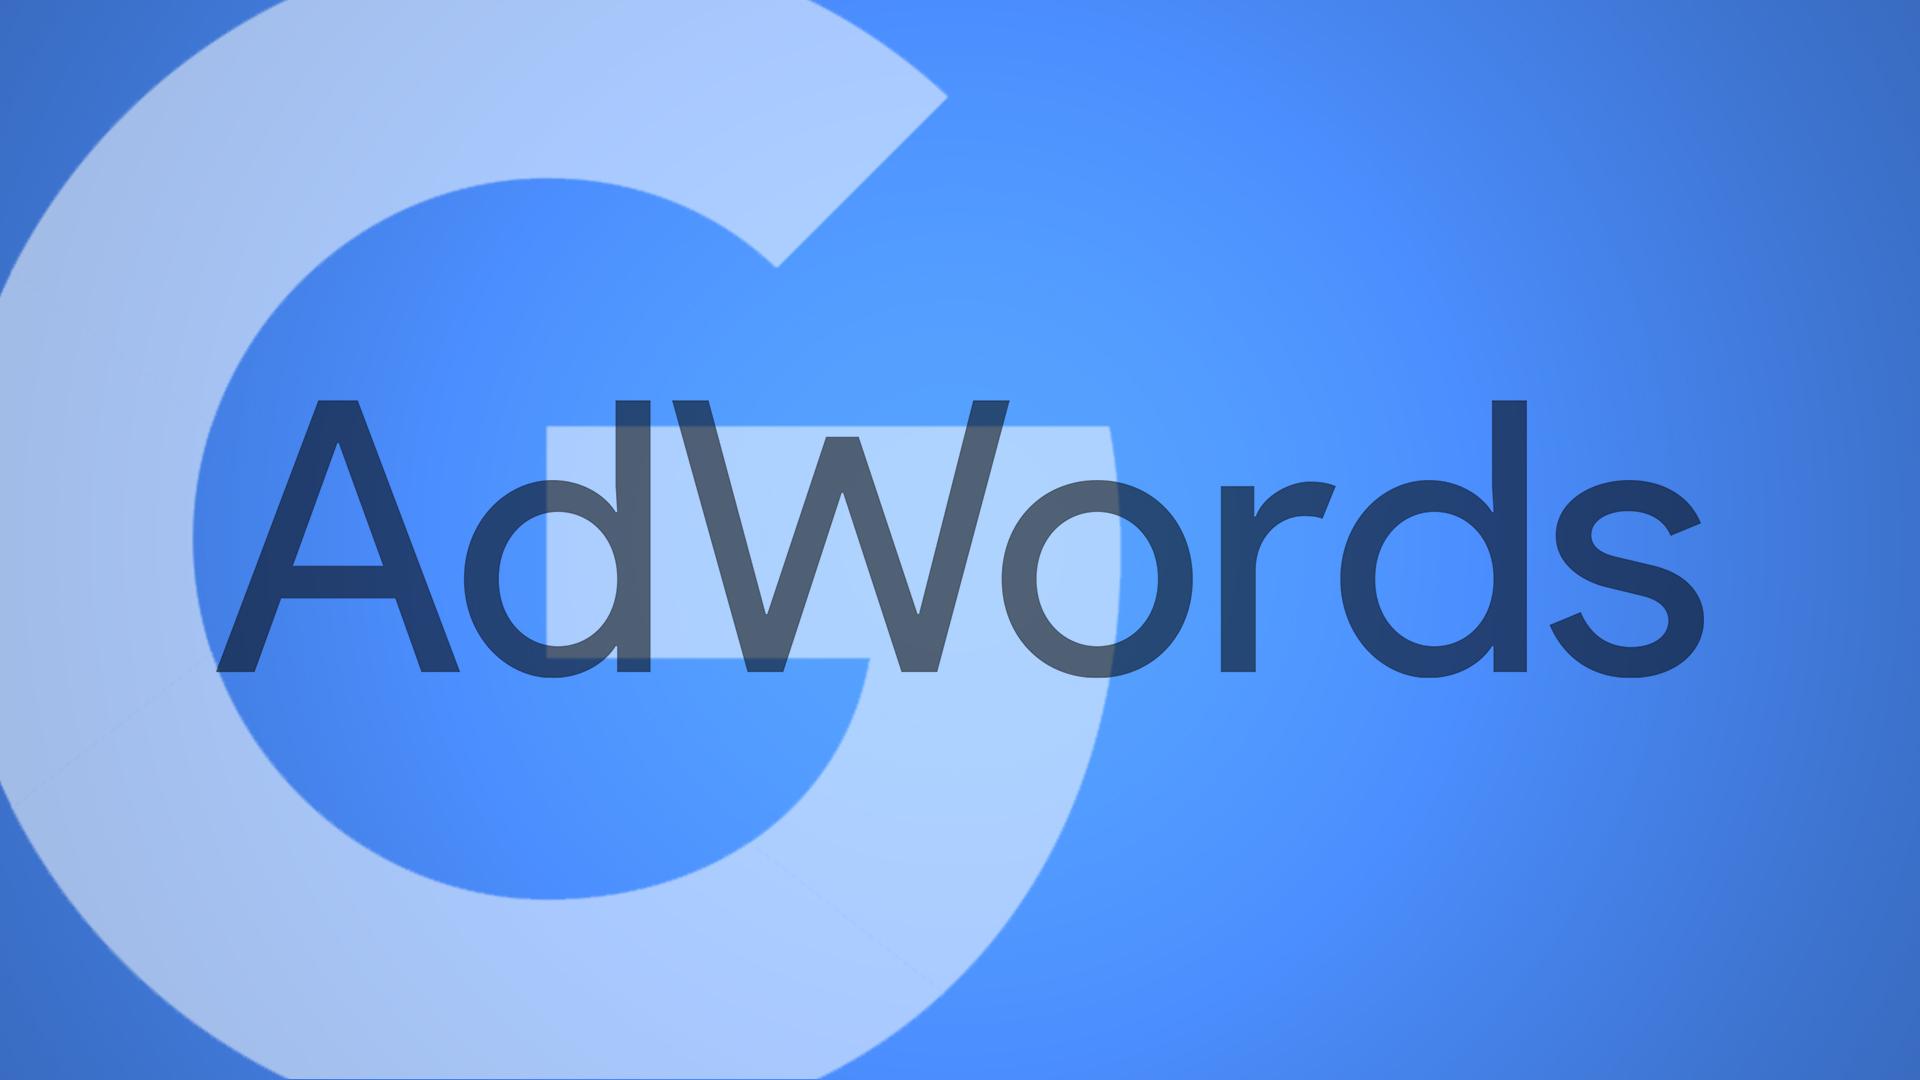 google-adwords-blue3-1920